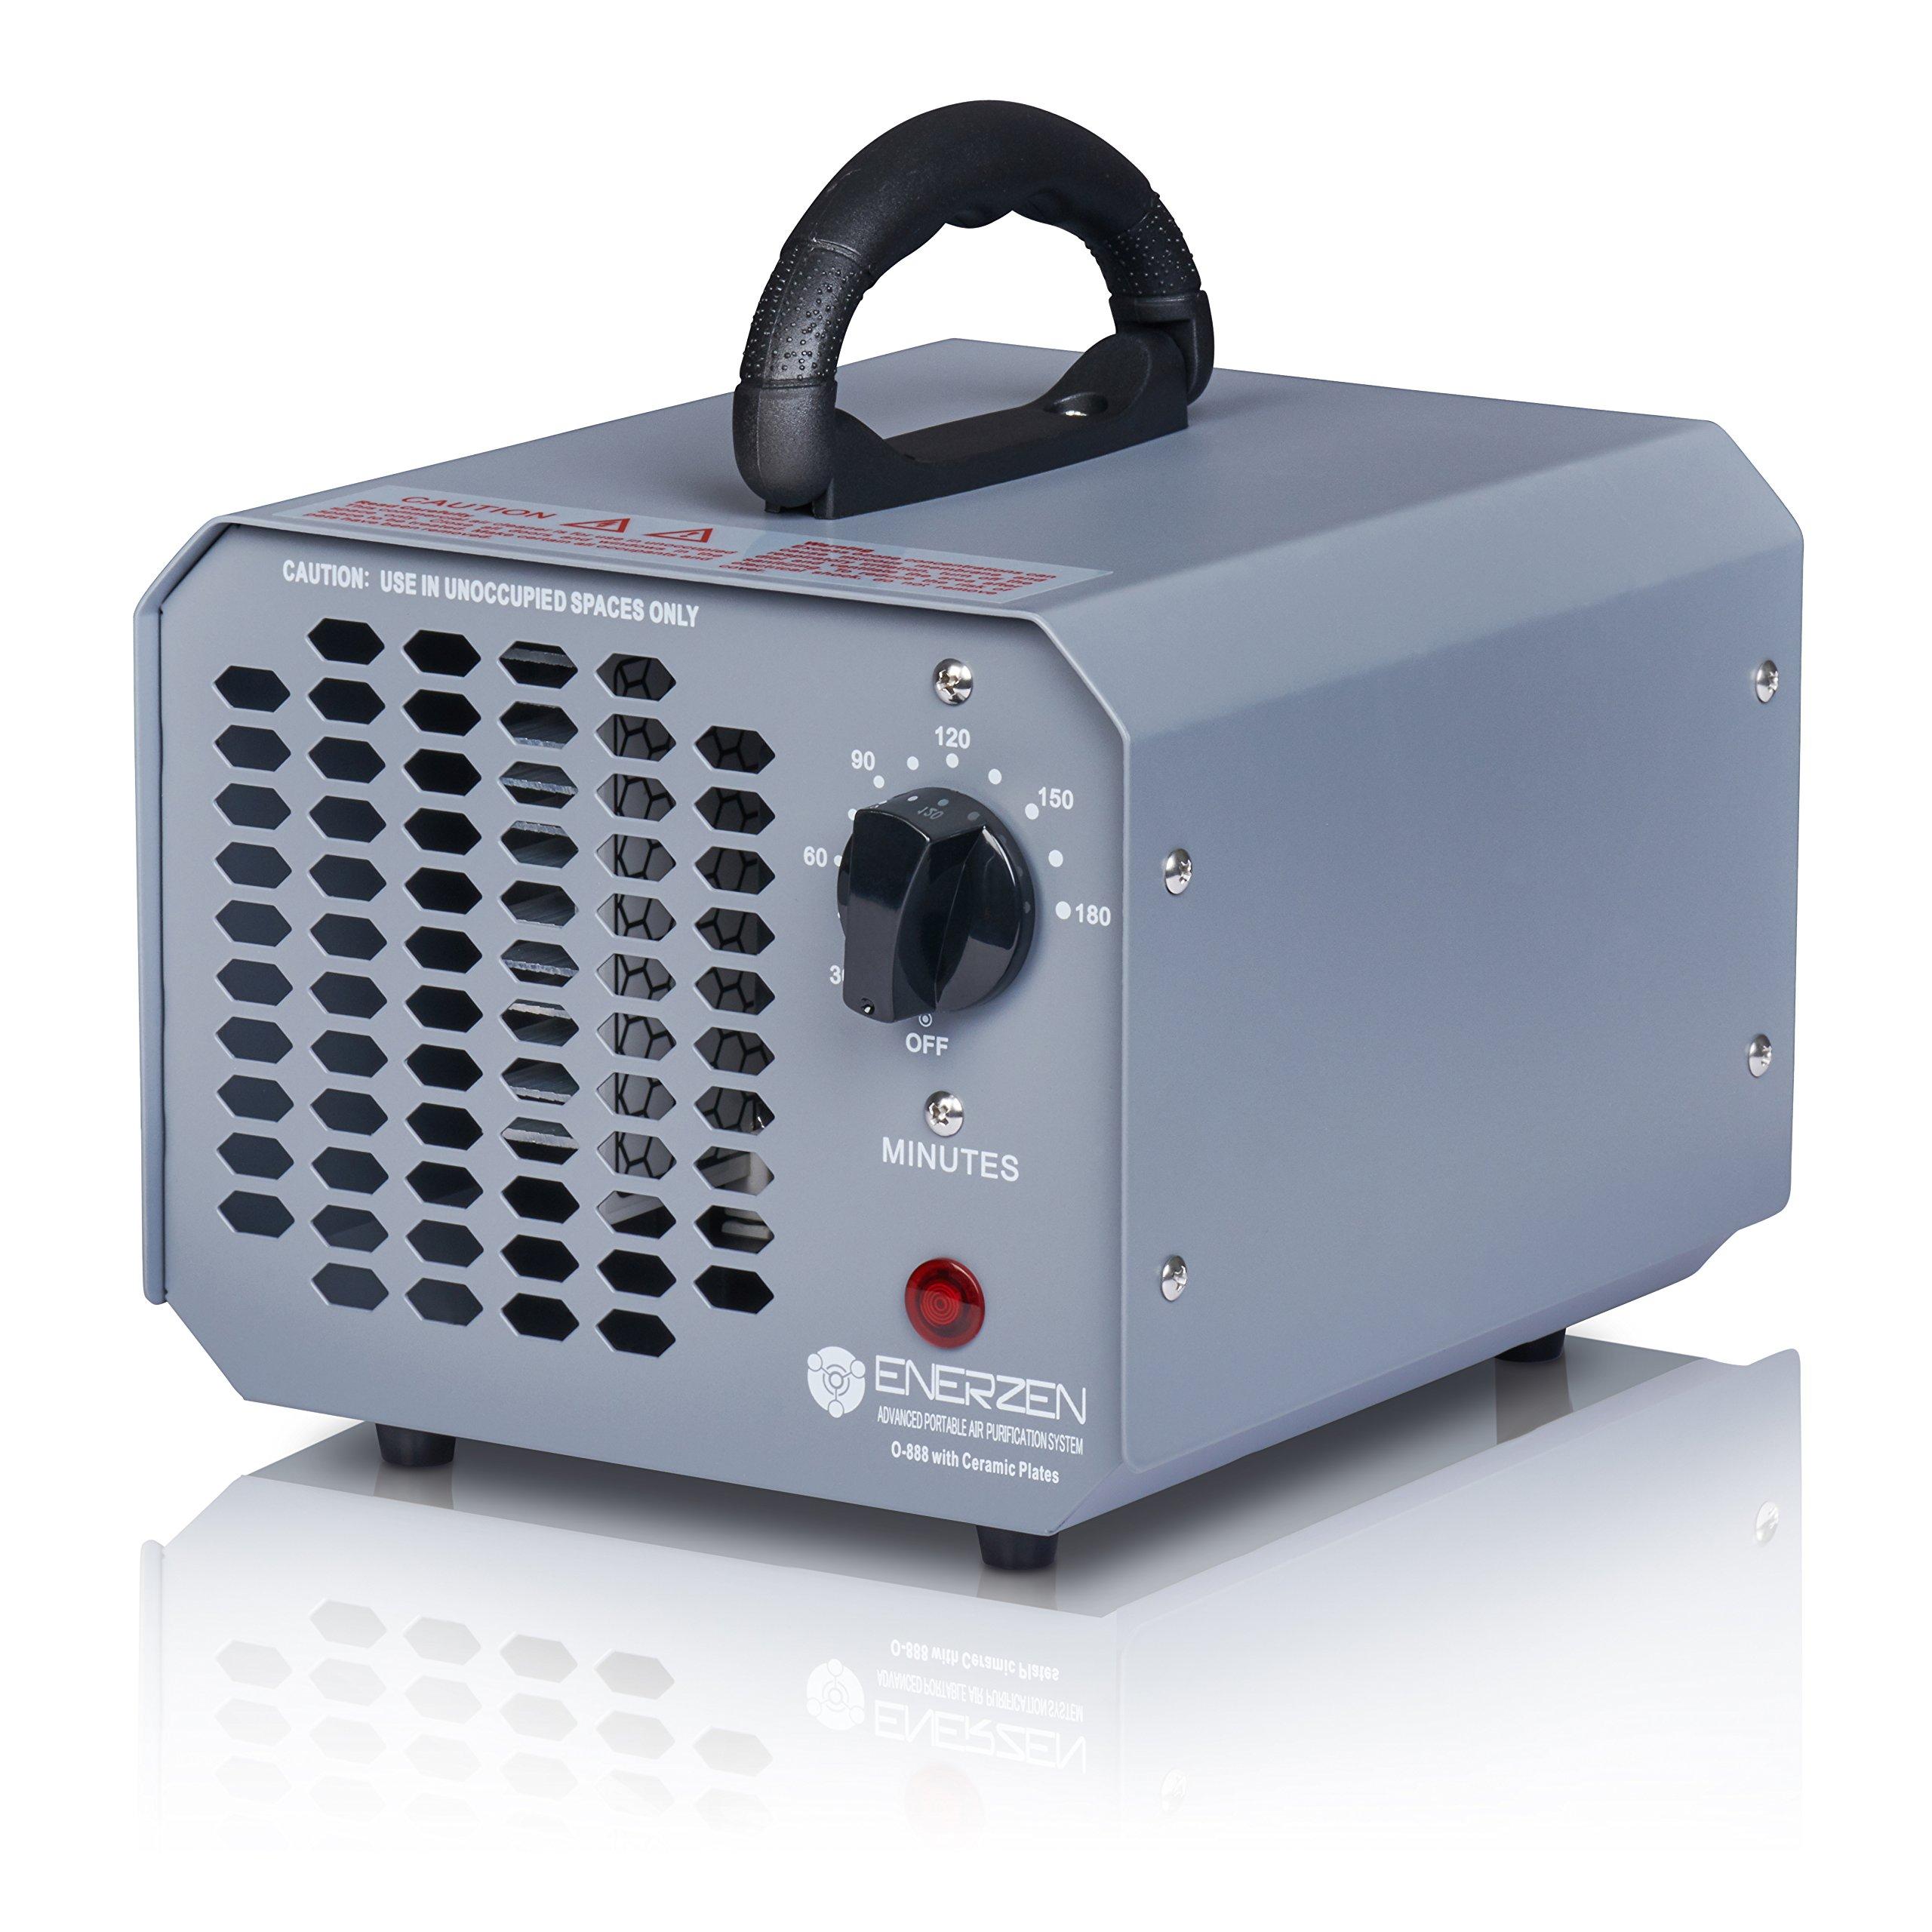 Enerzen High Capacity Commercial Ozone Generator 9,000mg Industrial Strength O3 Air Purifier Deodorizer Sterilizer (9,000mg - Gray)